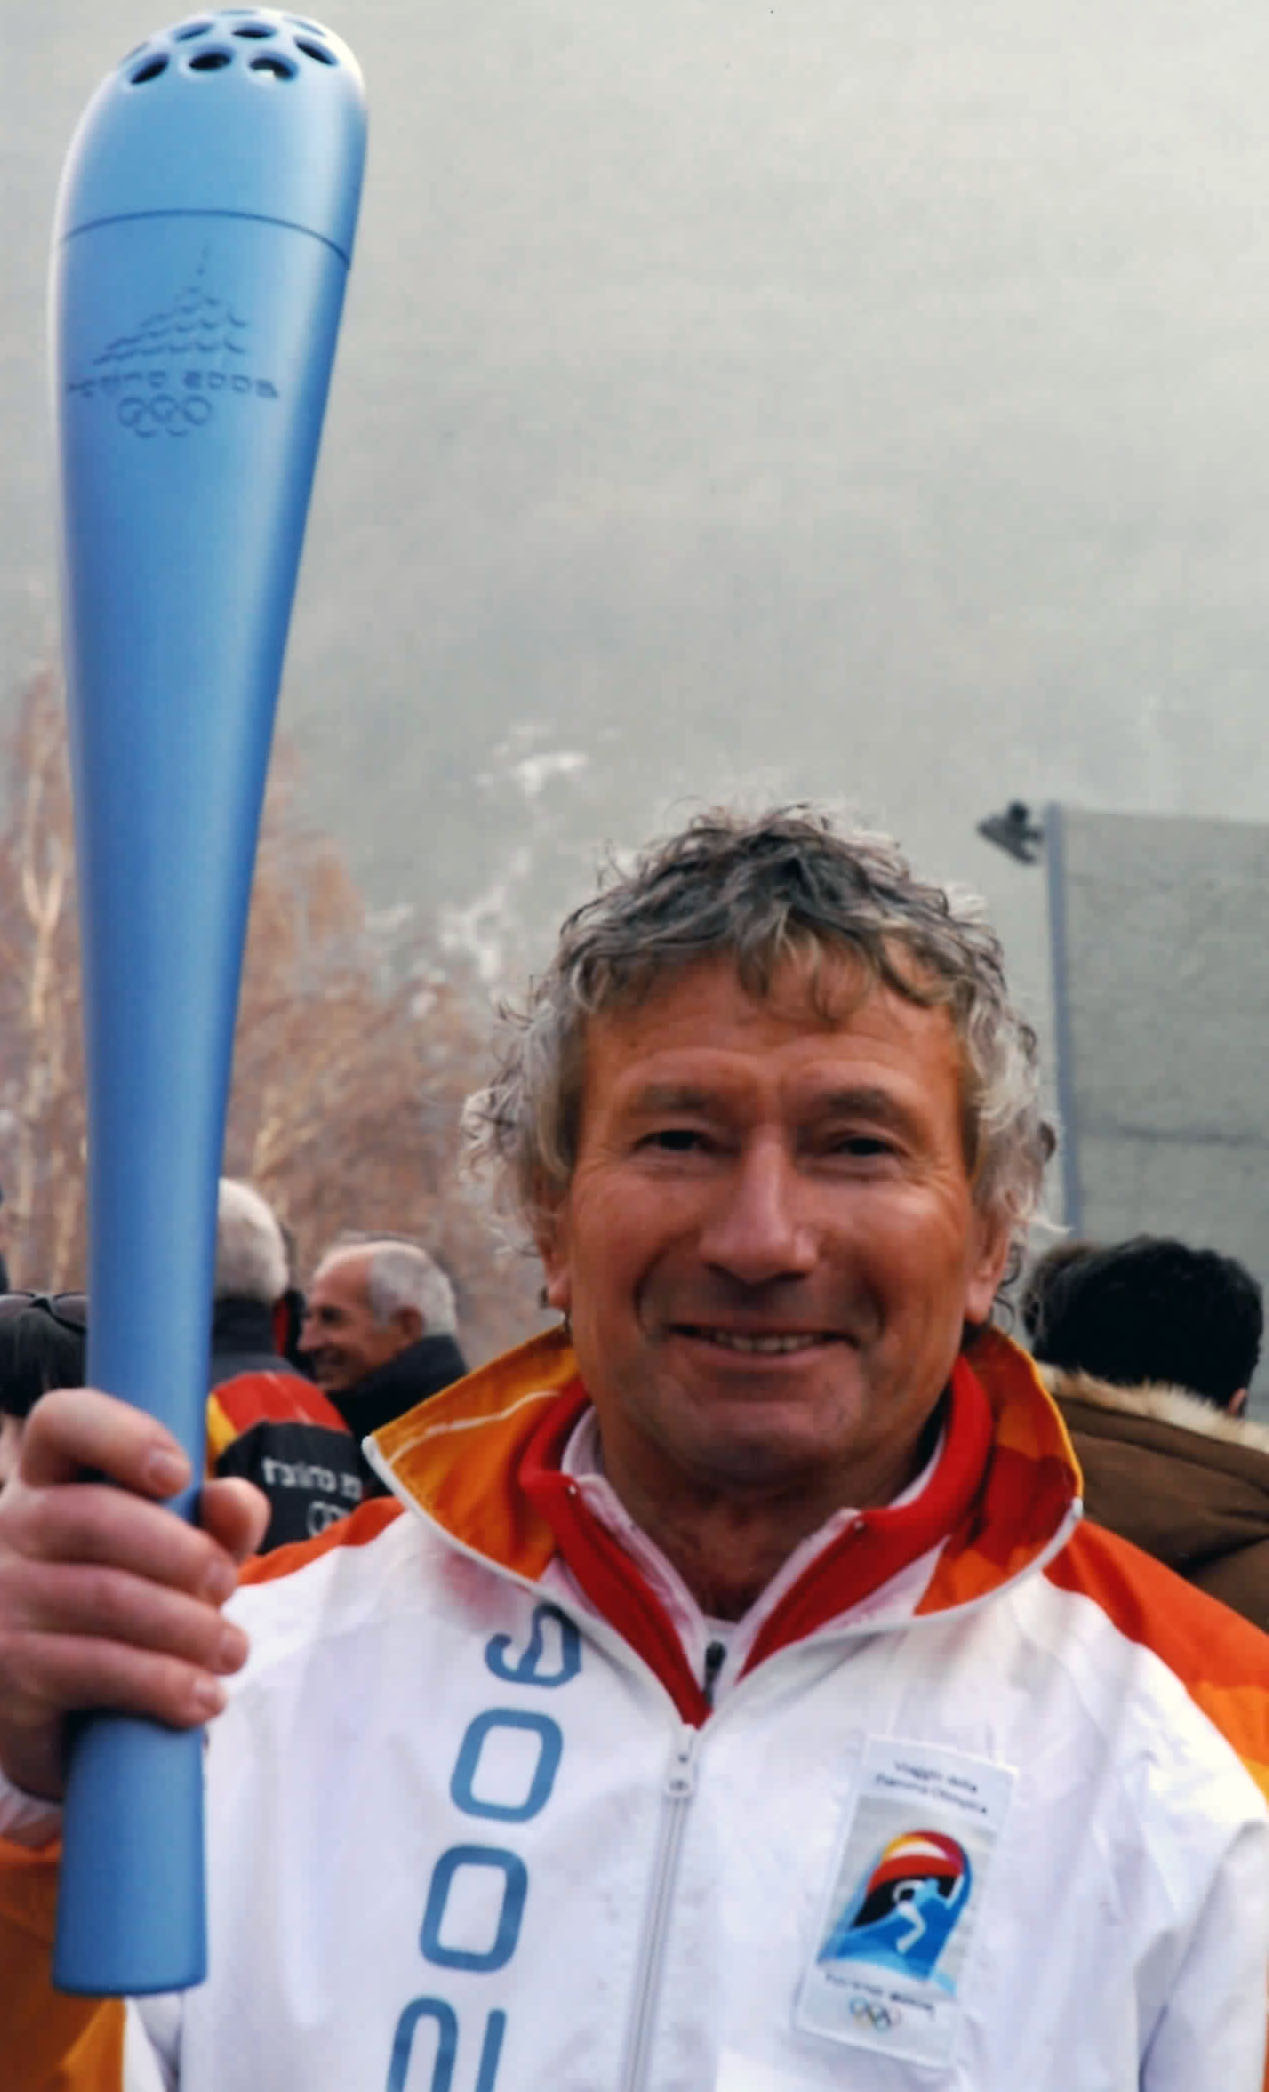 [Olimpiadi Invernali] Willy Bertin e quelle medaglie mancate